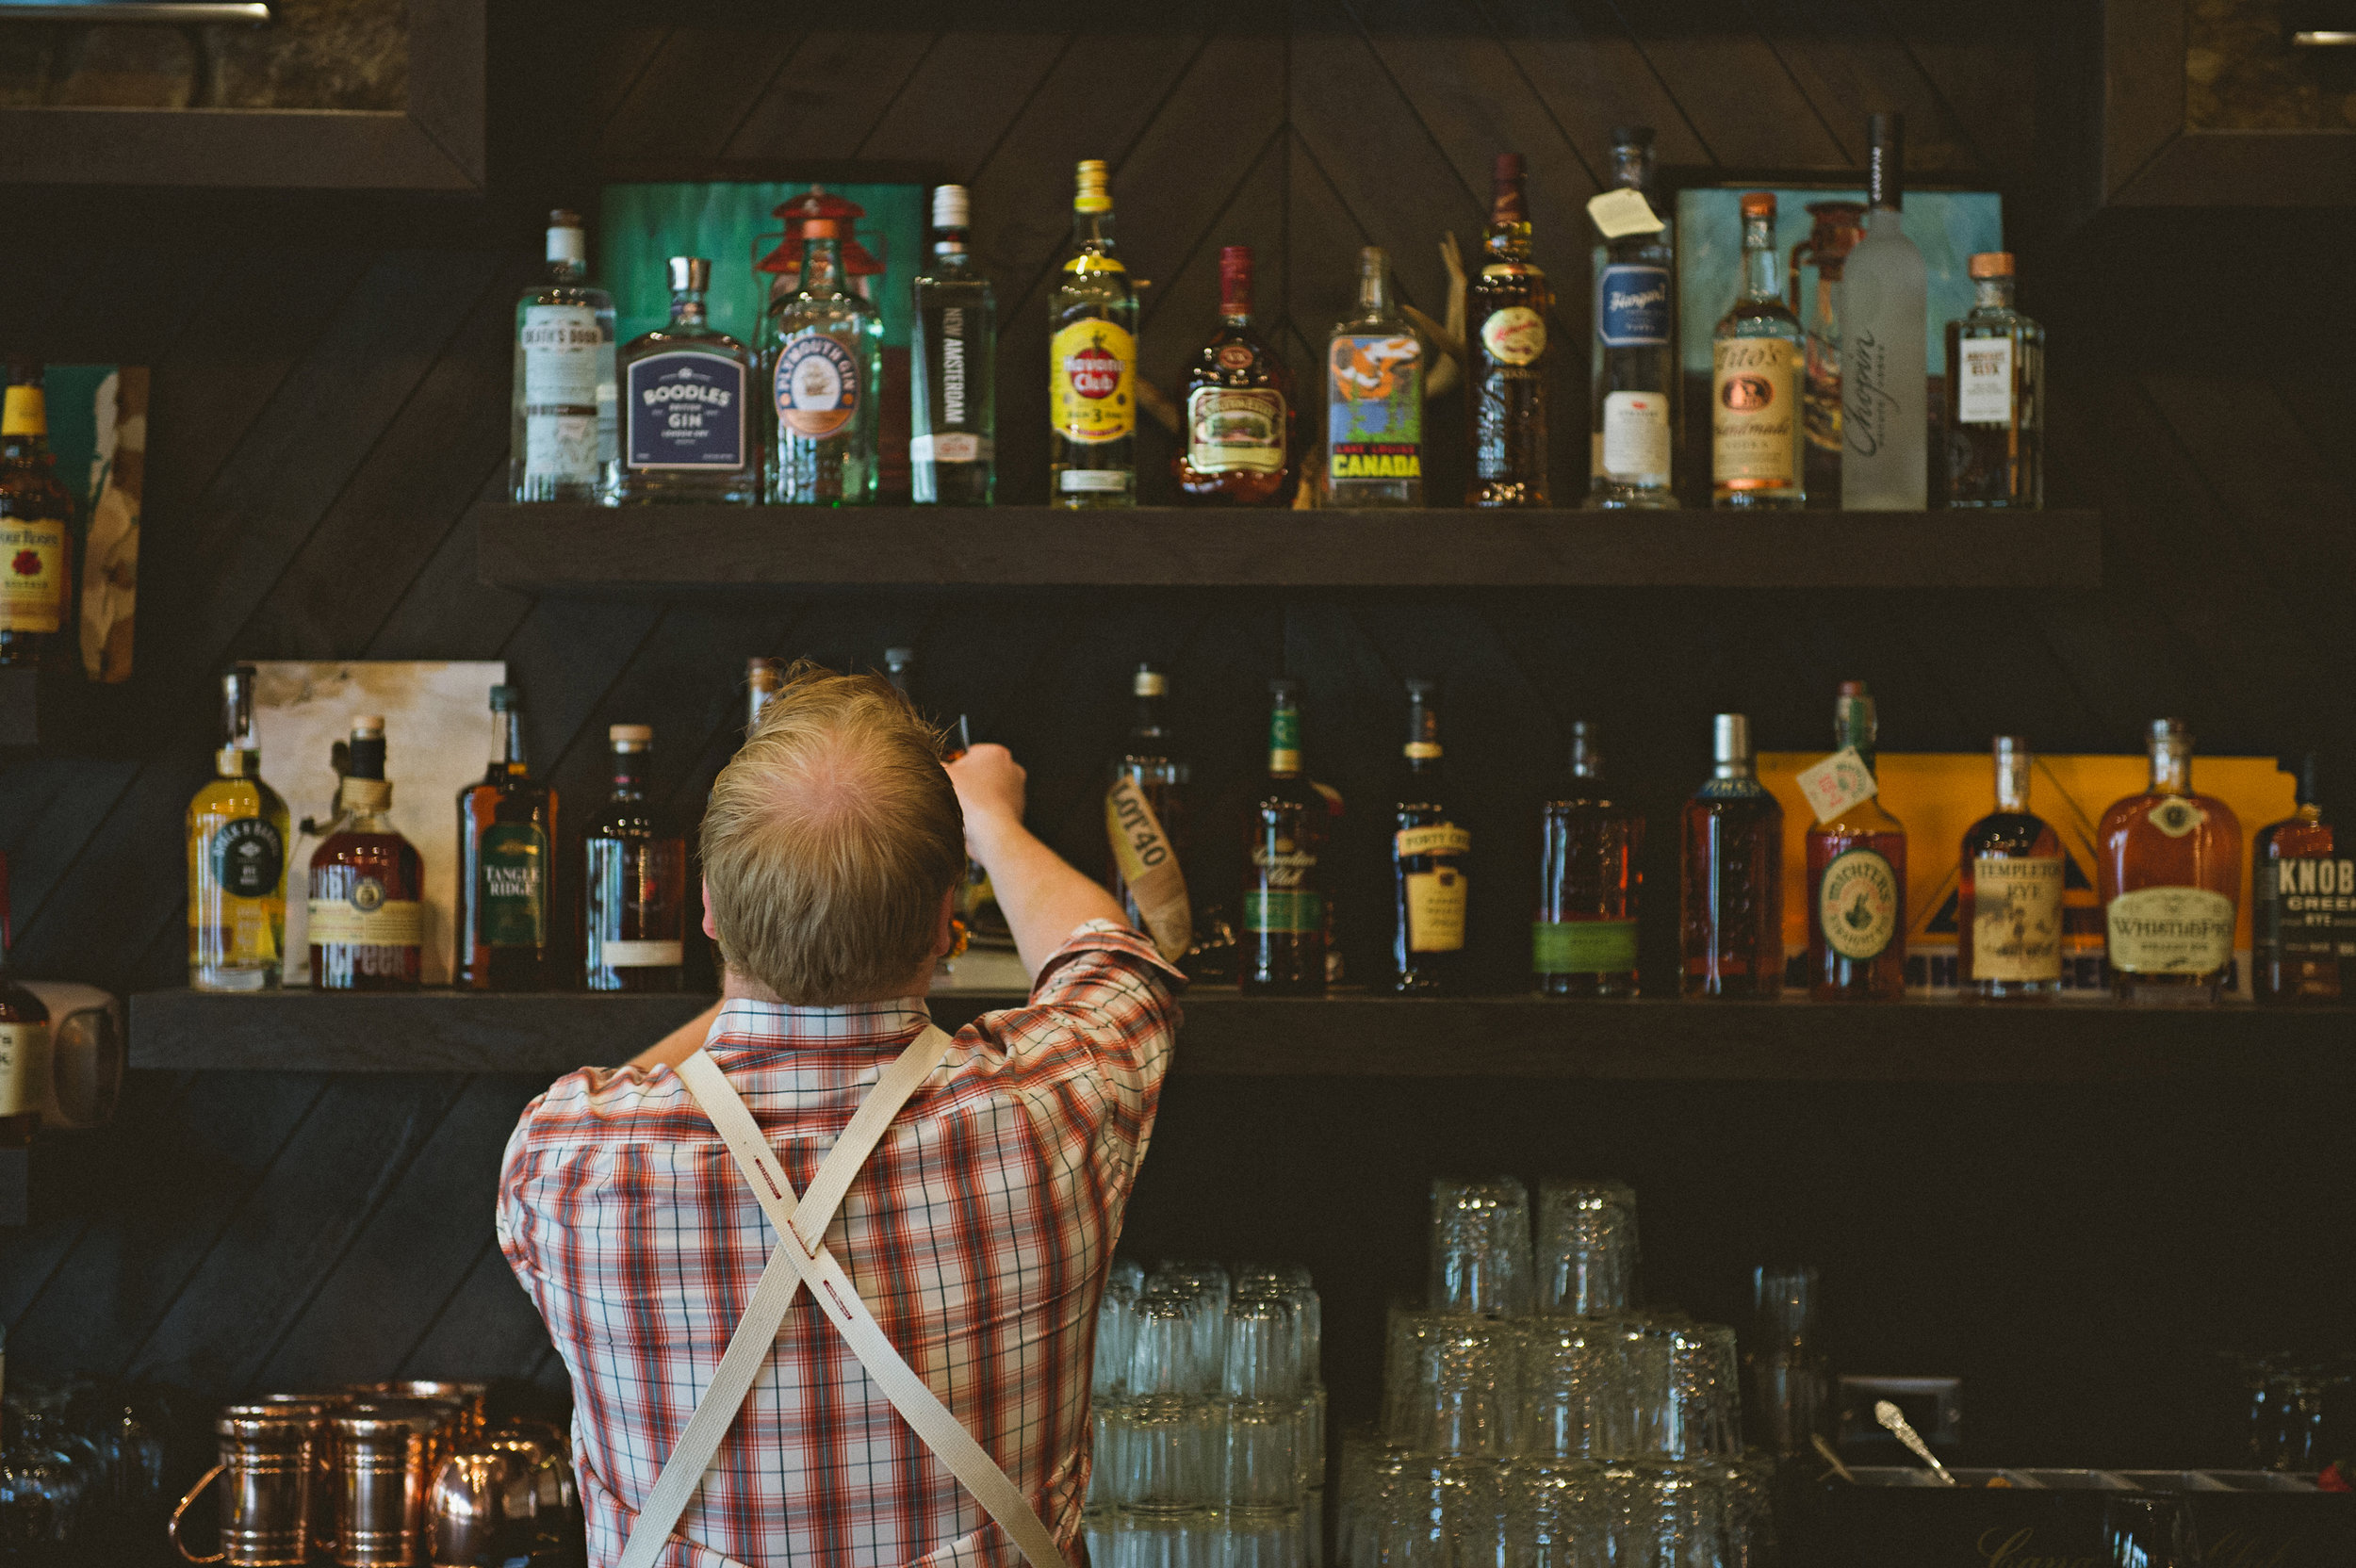 PARK_Distillery_Banff_0018.jpg